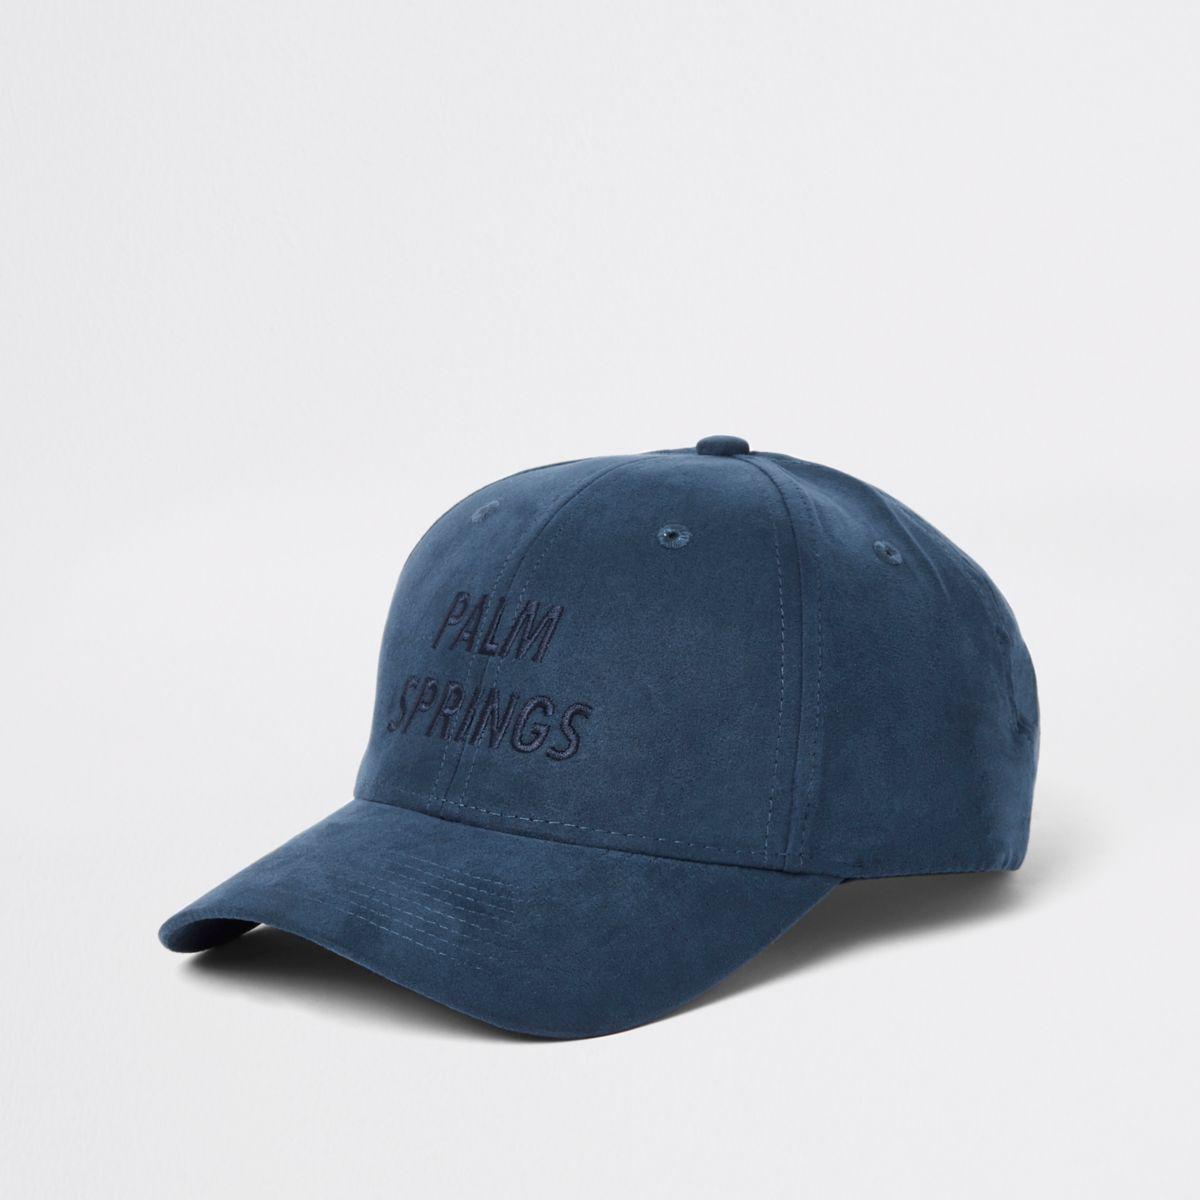 Casquette de baseball bleue avec inscription « palm springs » brodée